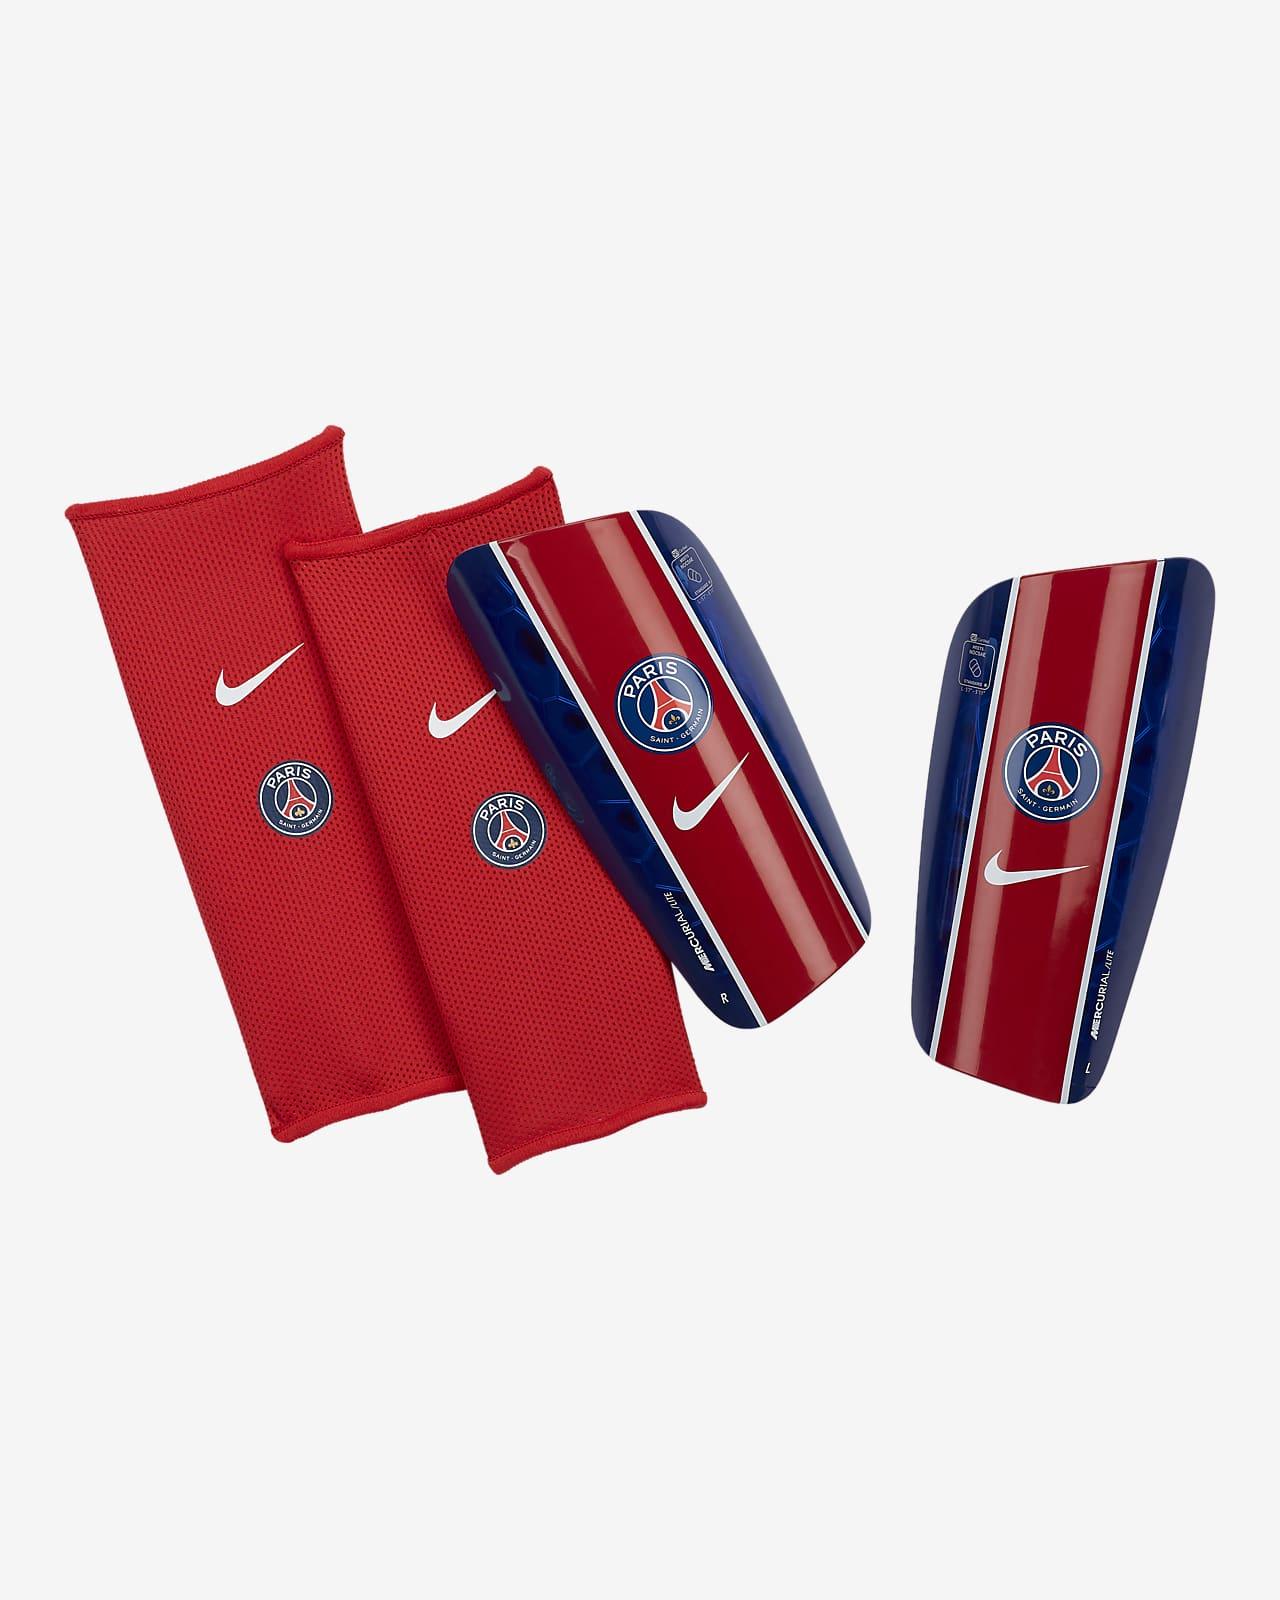 Protège-tibias de football Paris Saint-Germain Mercurial Lite